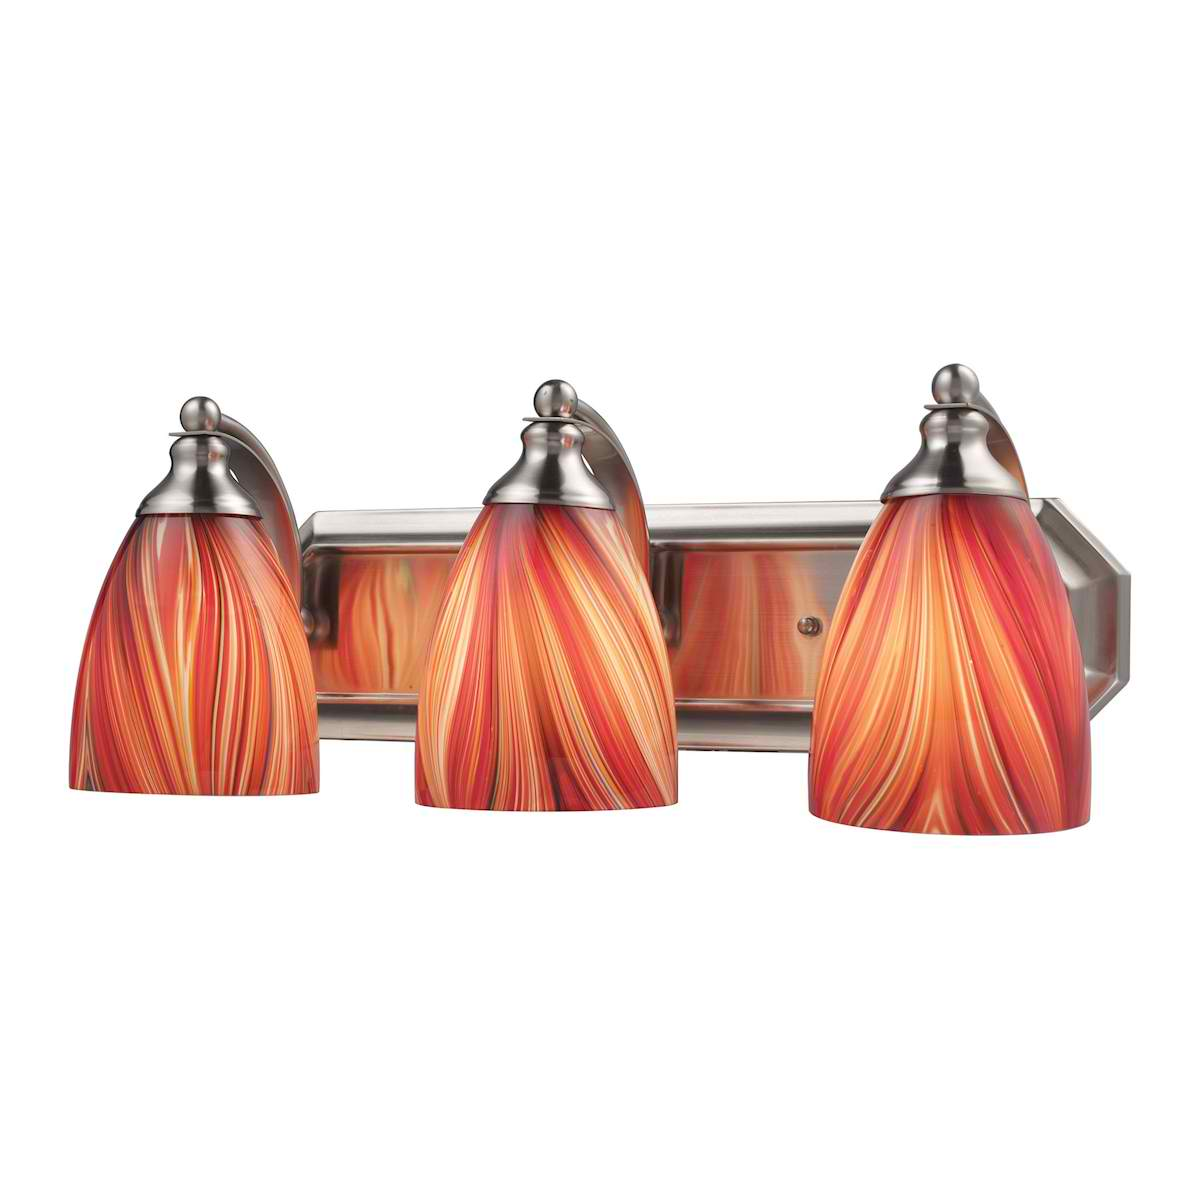 Vanity 3 Light in Satin Nickel with Multi Glass